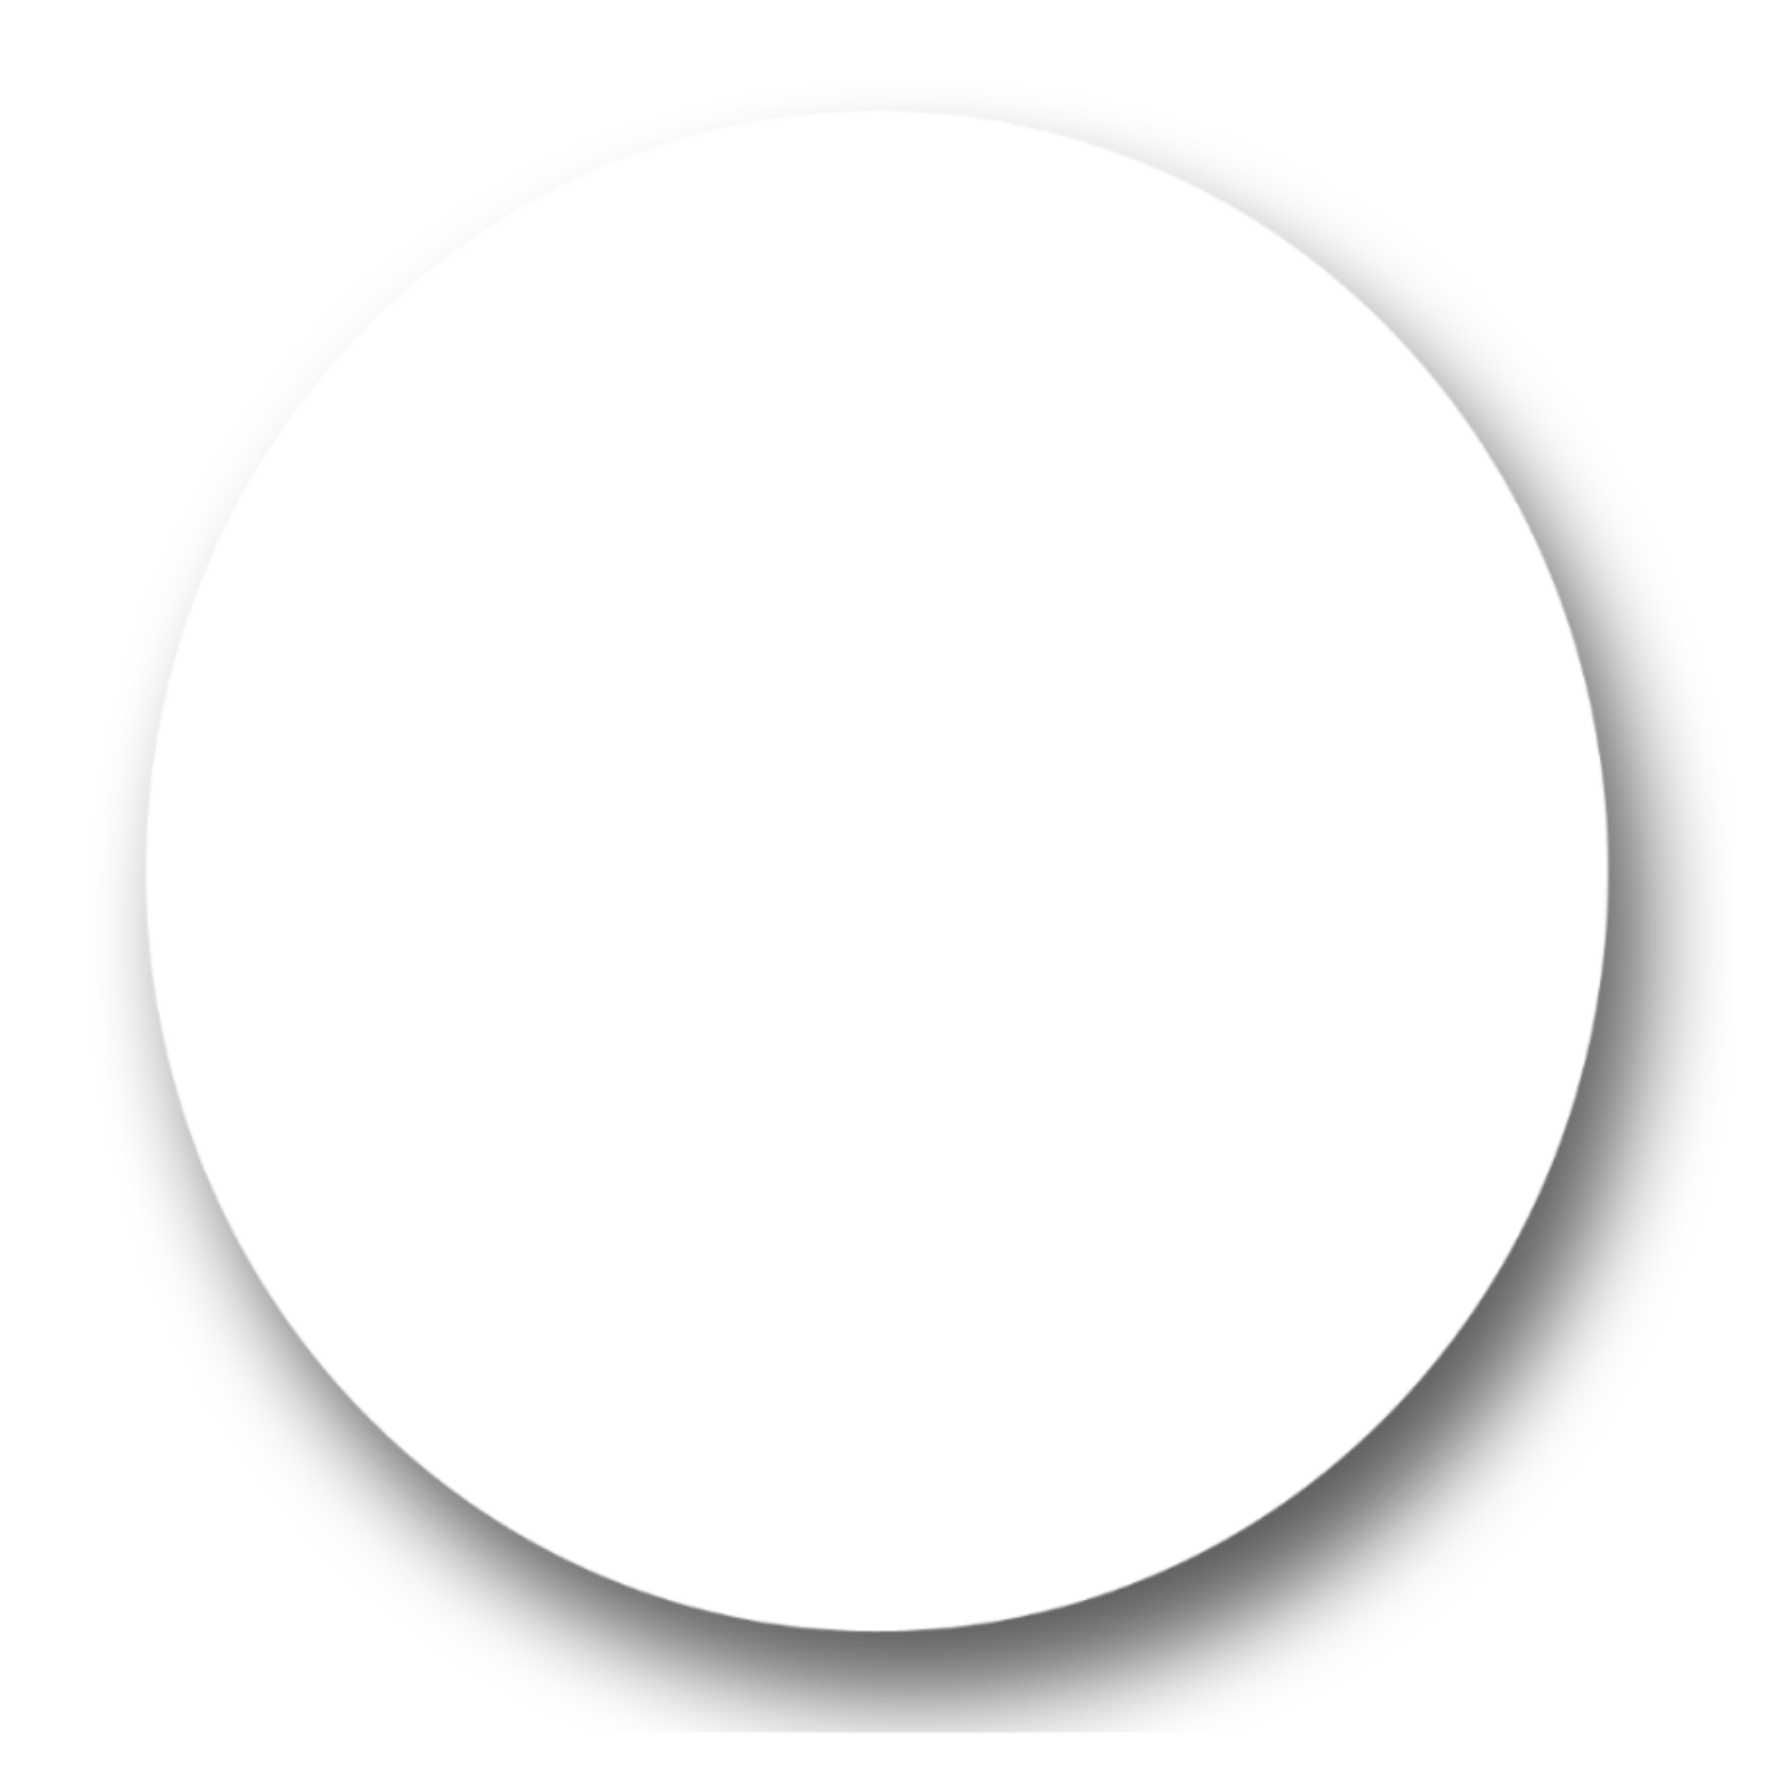 Circle Background Overlay Aesthetic Icon Overlay Kpop